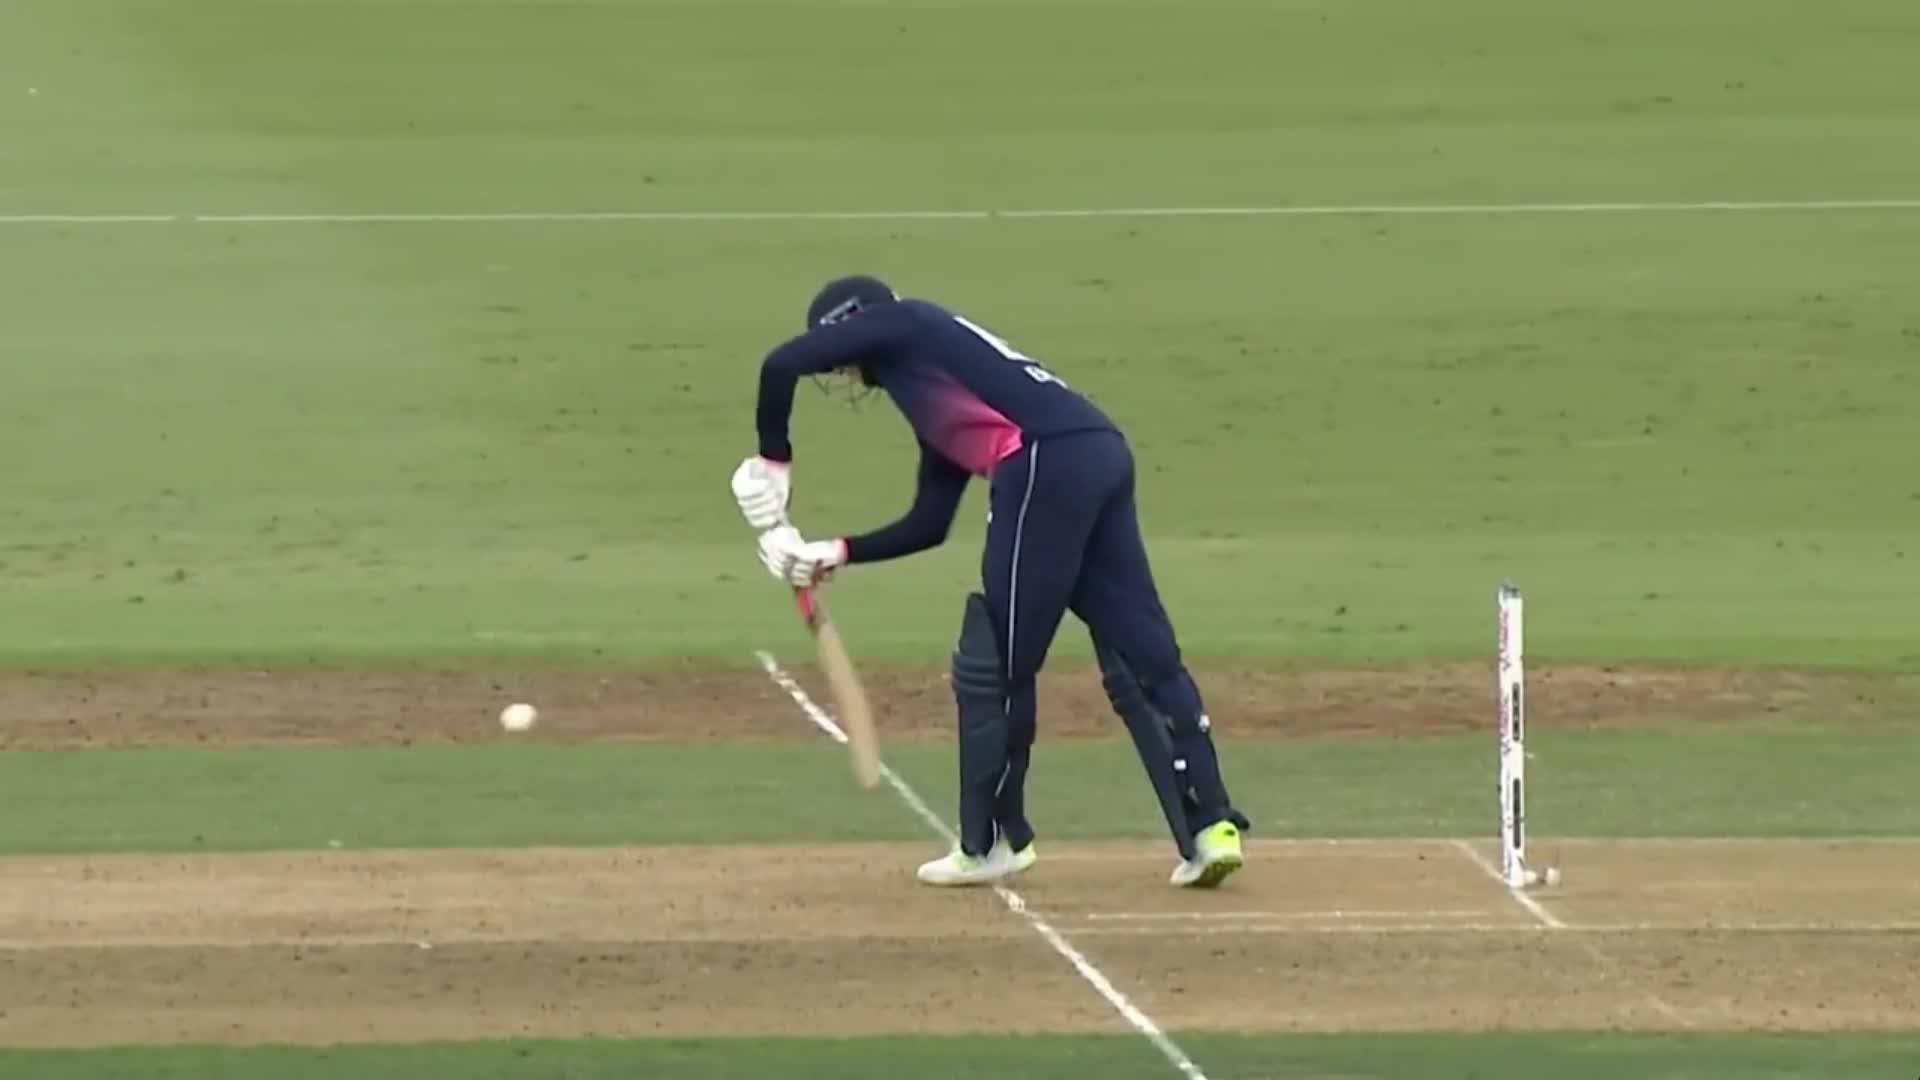 Cricket GIFs